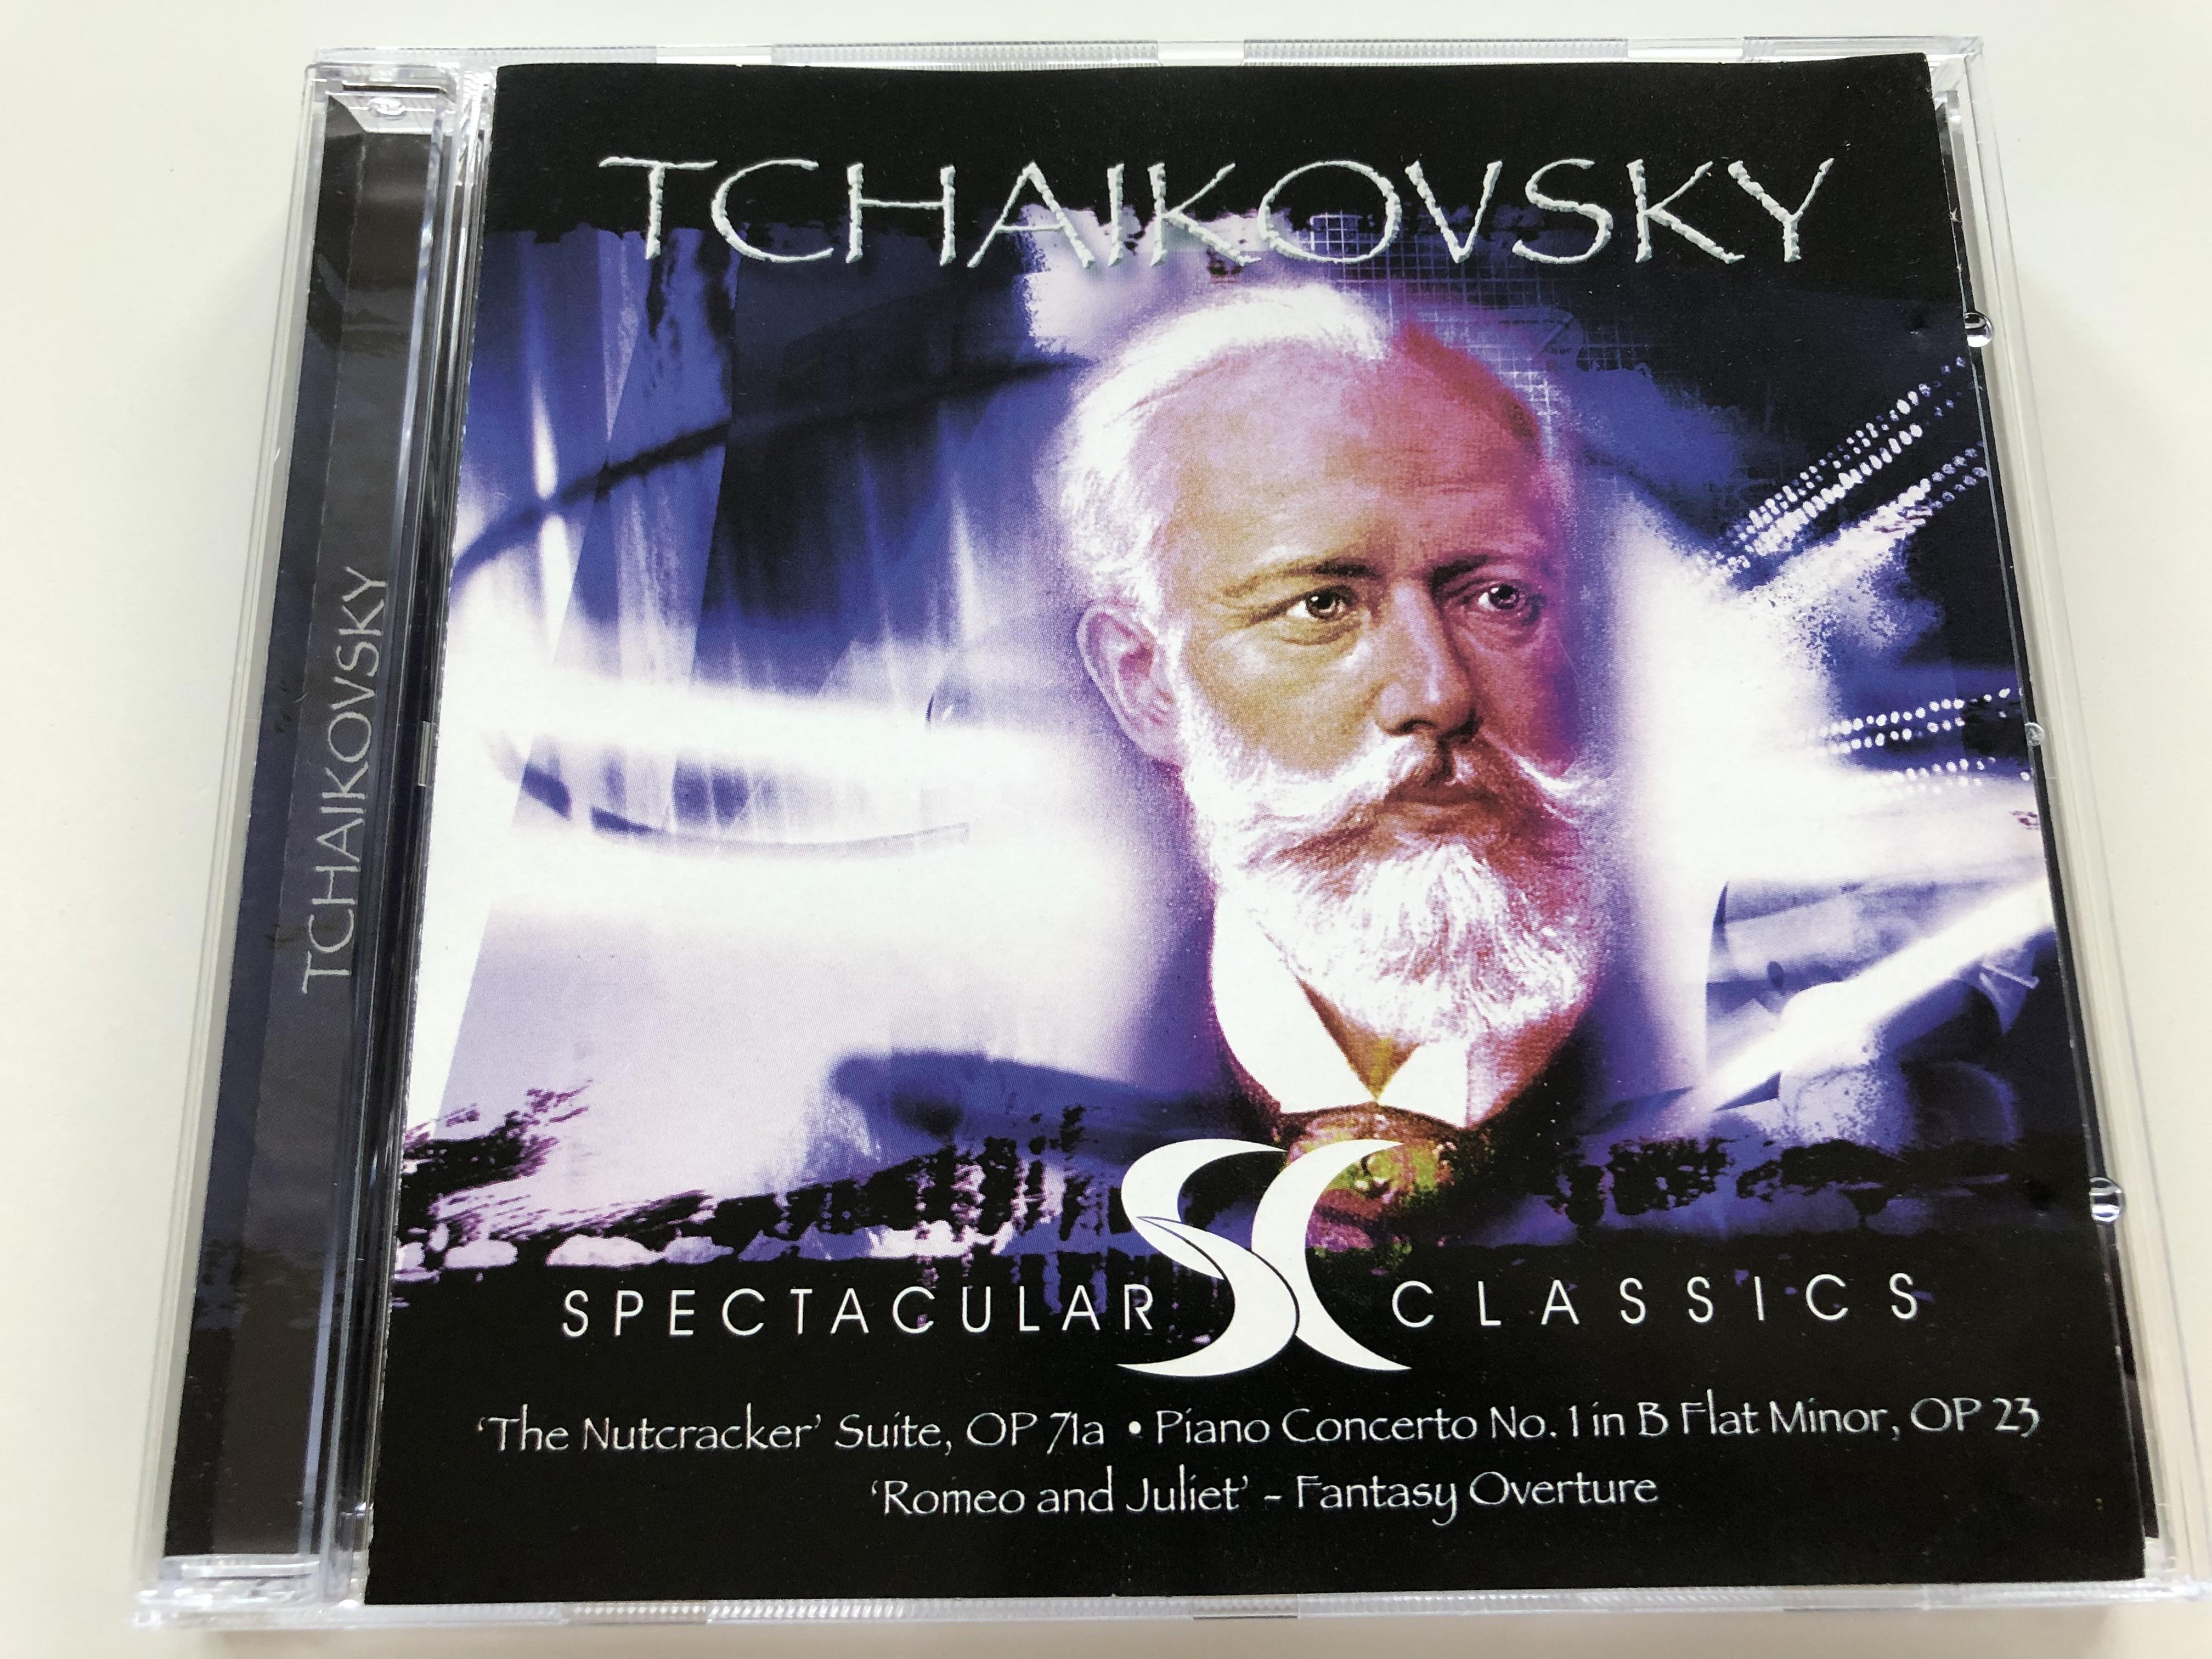 tchaikovsky-spectacular-classicsimg-2521.jpg